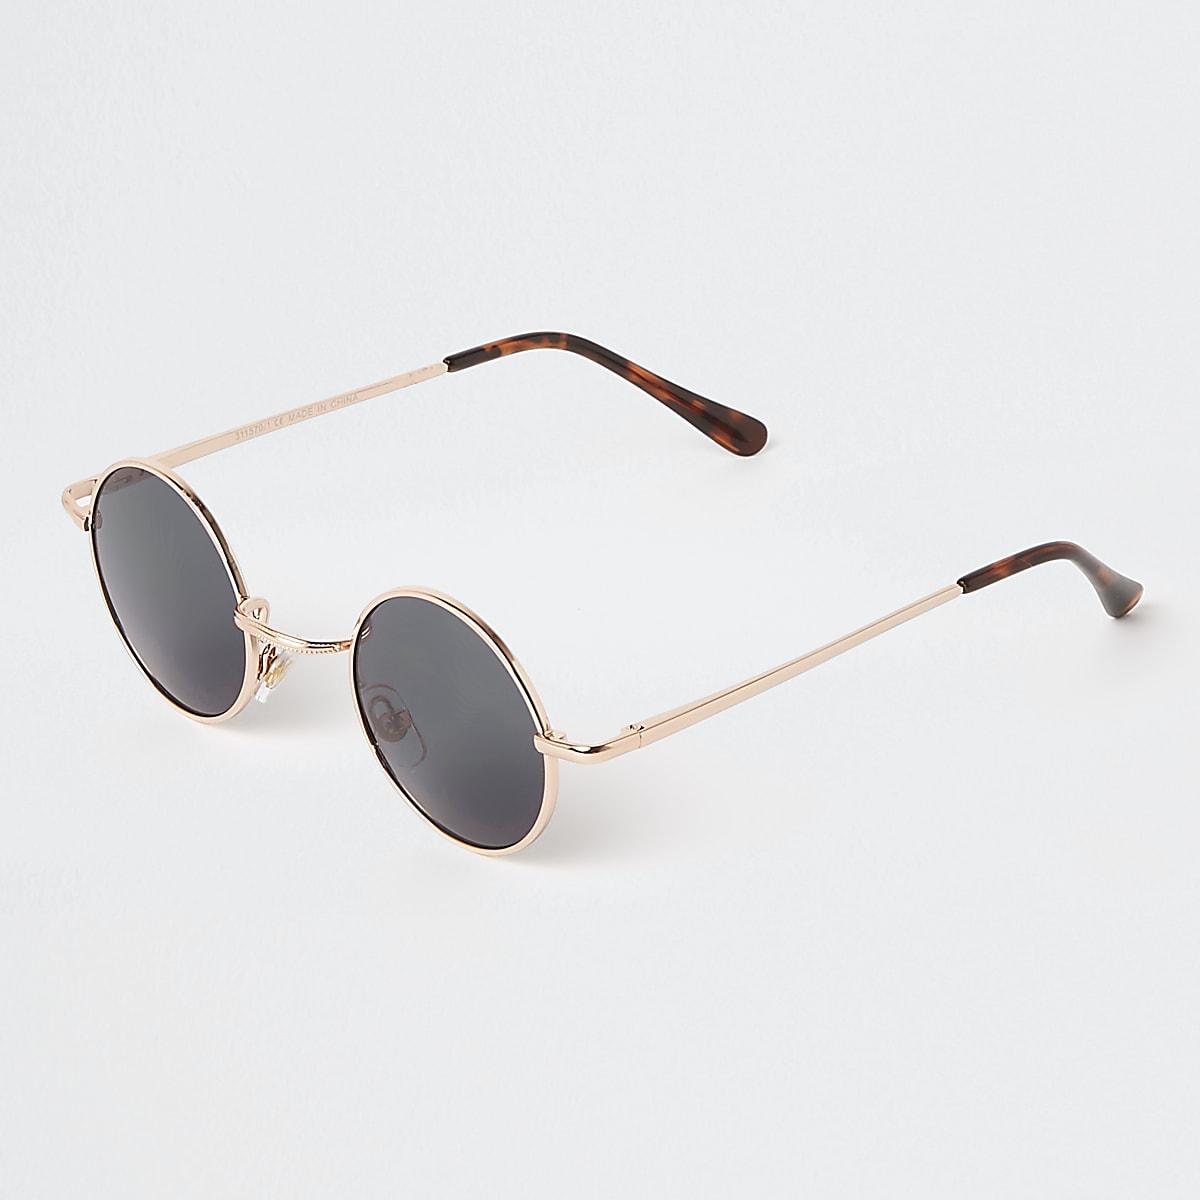 Zonnebril Met Kleine Ronde Glazen.Gold Tone Small Round Smoke Lens Sunglasses